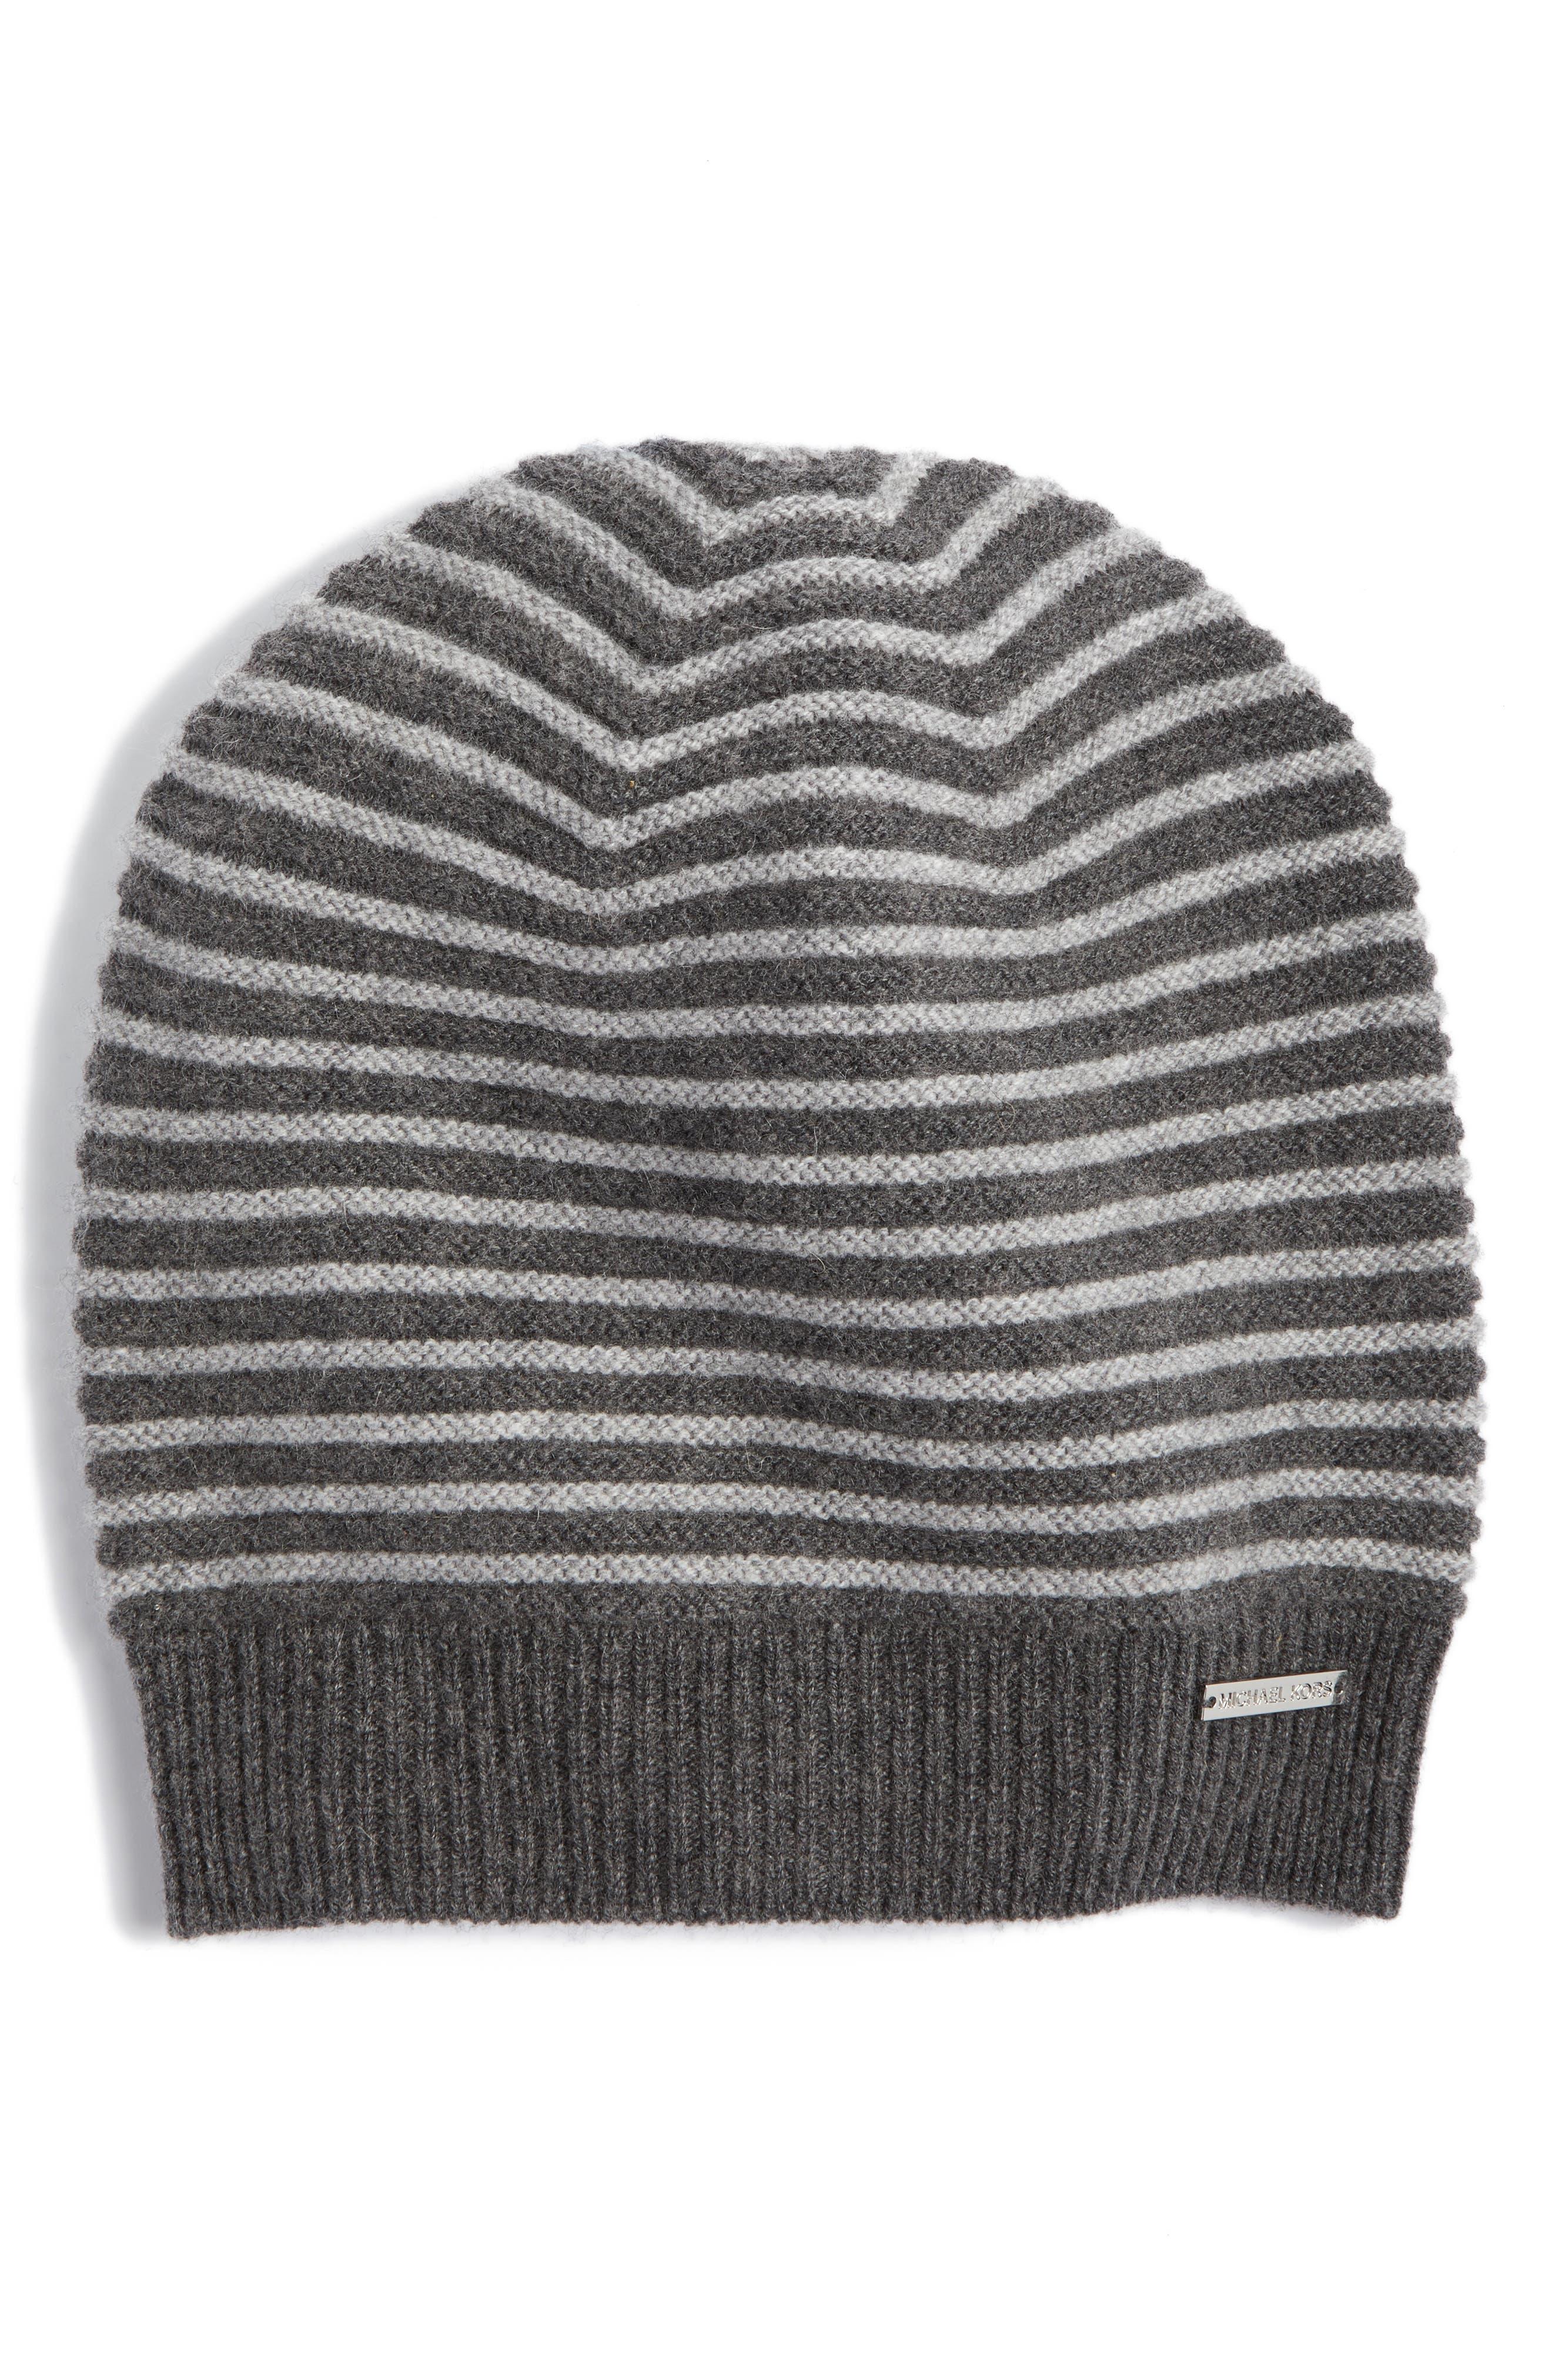 Double Links Wool & Cashmere Hat,                             Main thumbnail 2, color,